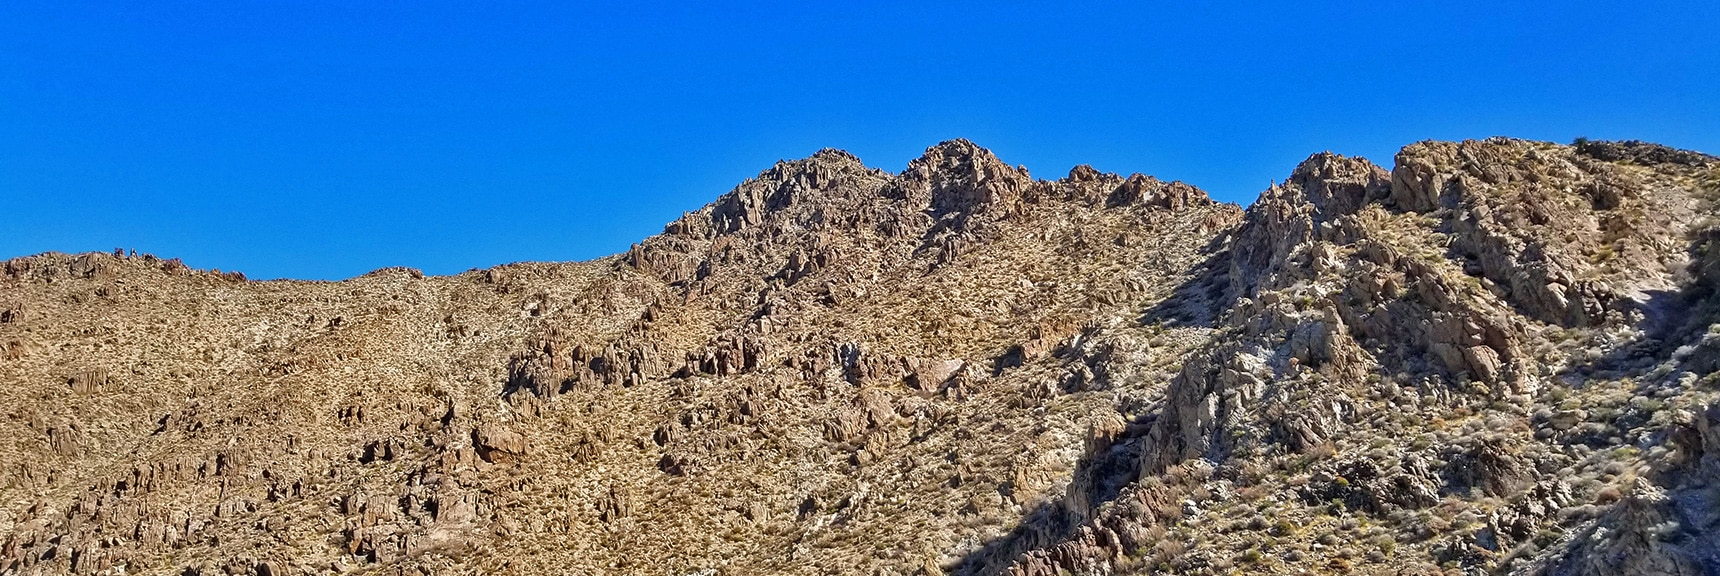 Mt. Wilson Final Summit Approach from Western Approach Ridge | Mt Wilson, Black Mountains, Arizona, Lake Mead National Recreation Area